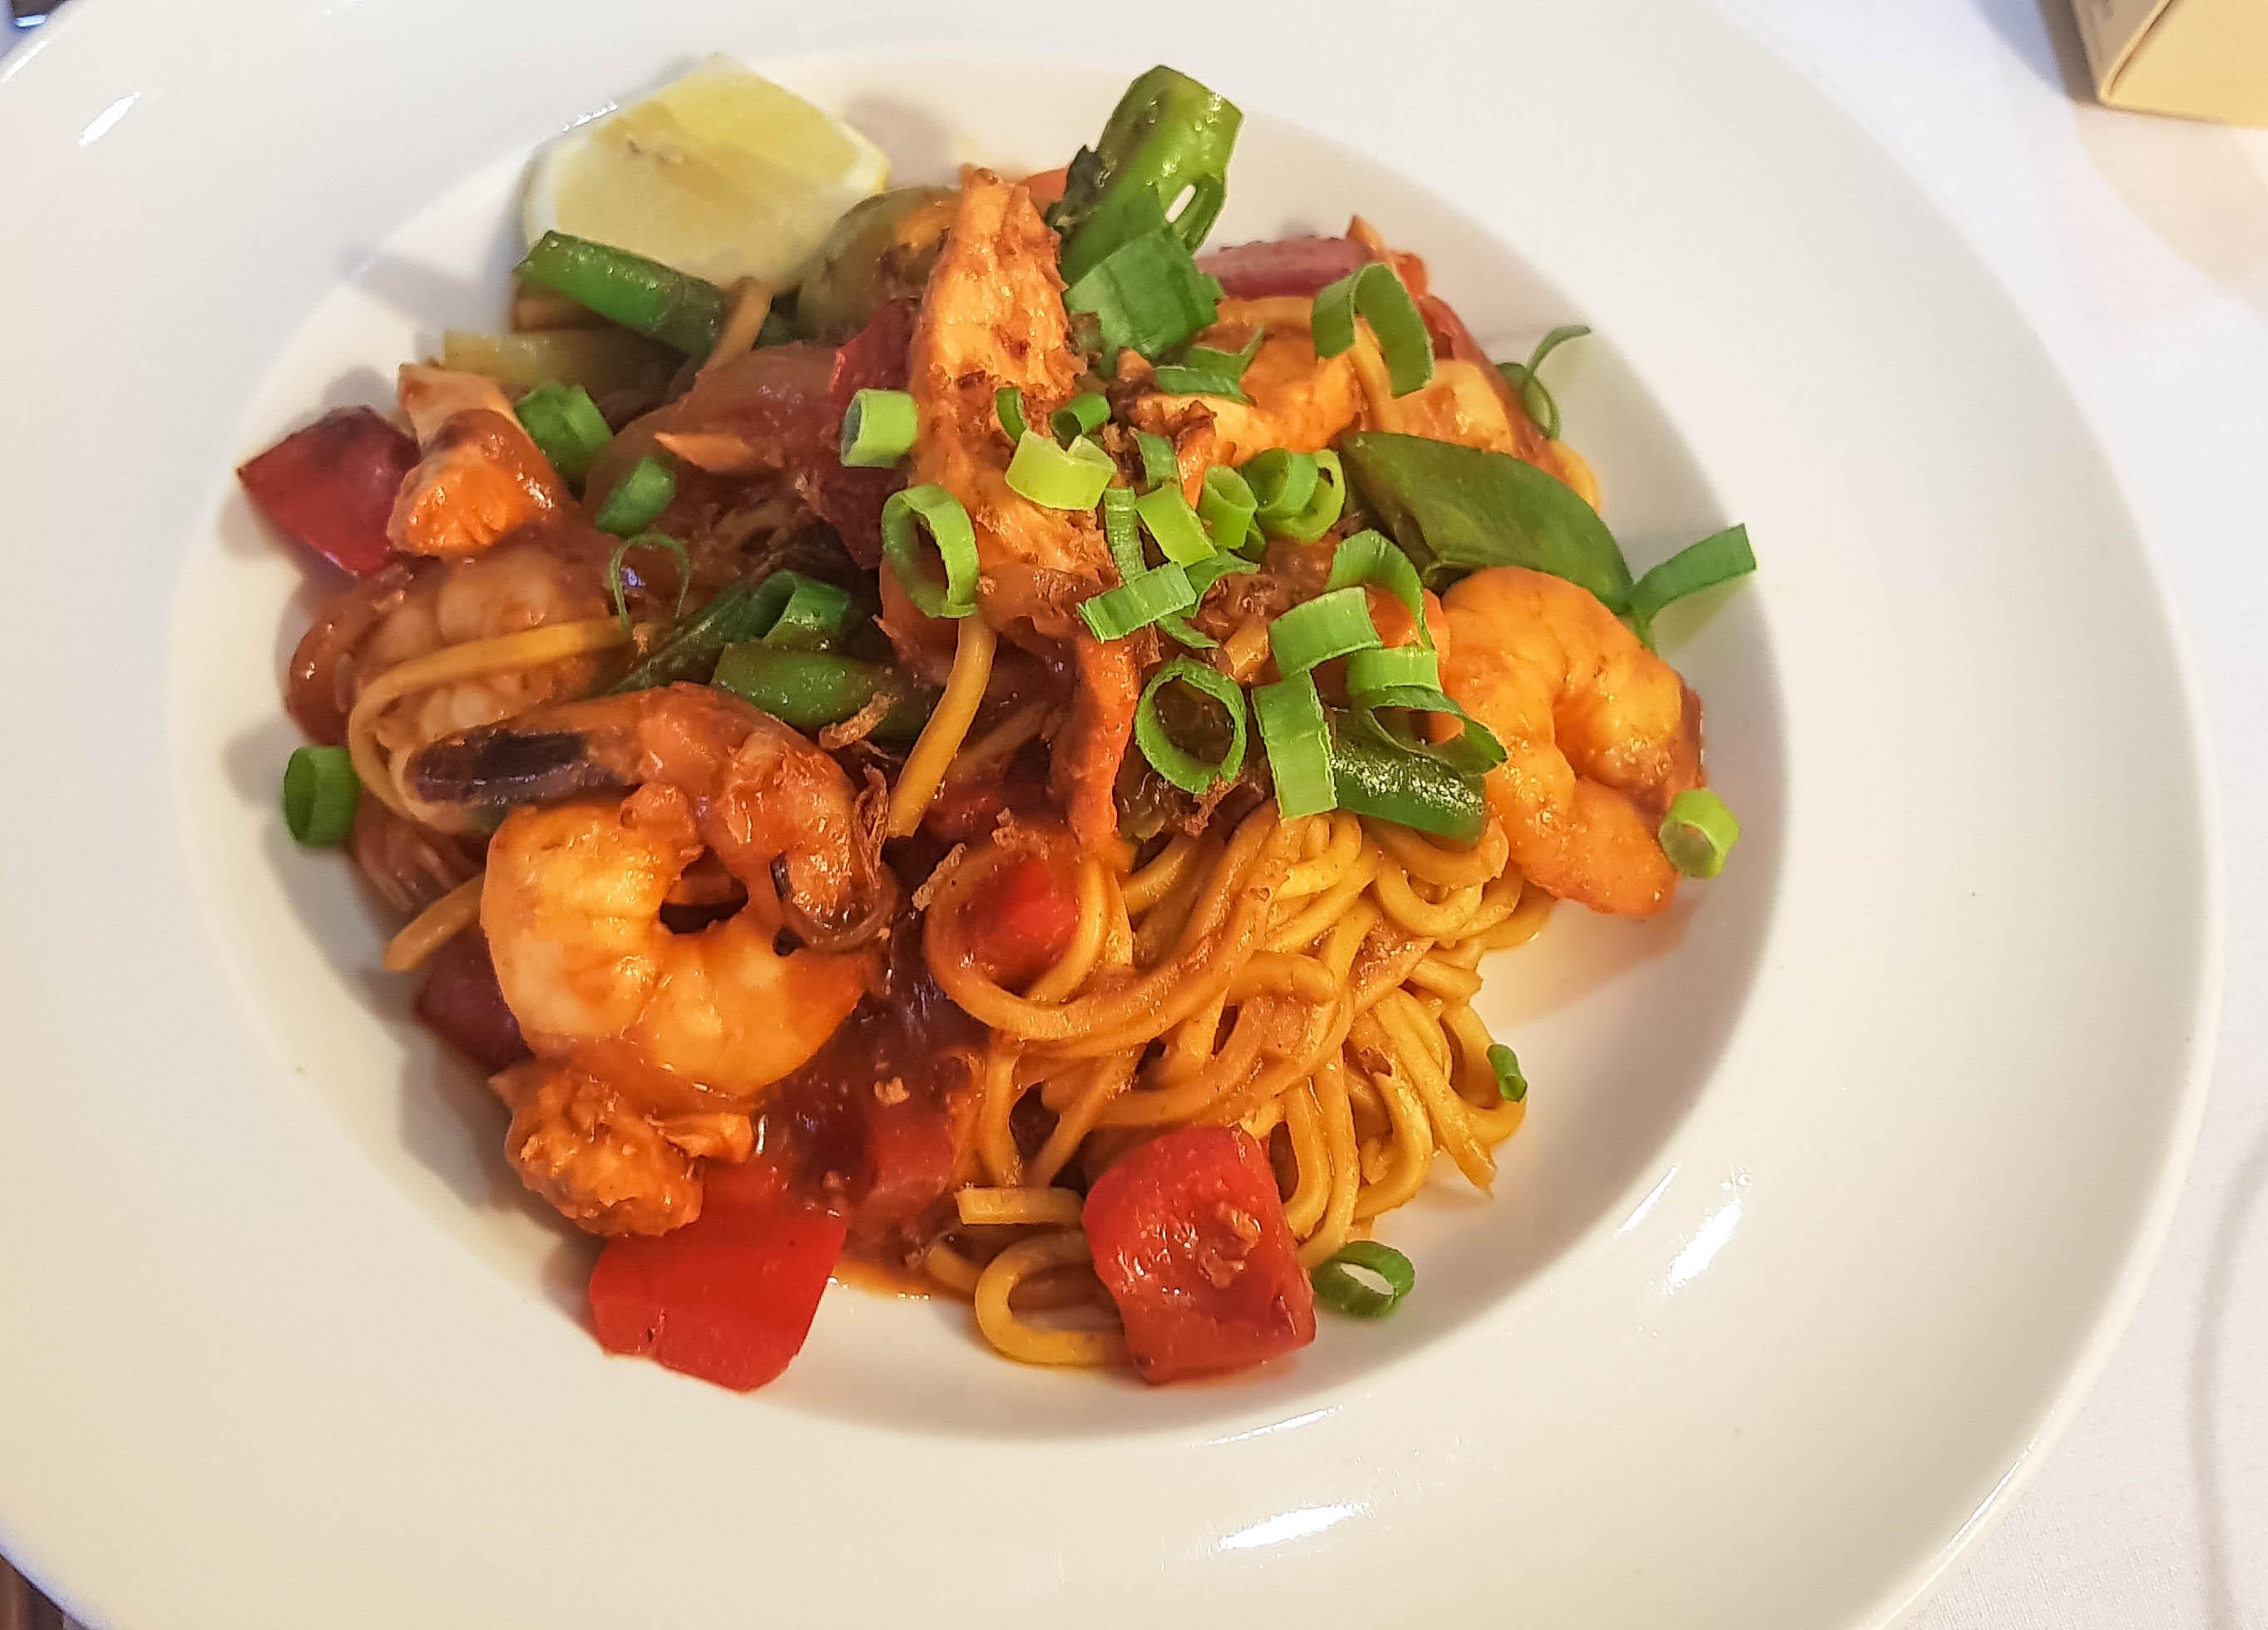 Room service - stir fry hokkien noodles with prawns